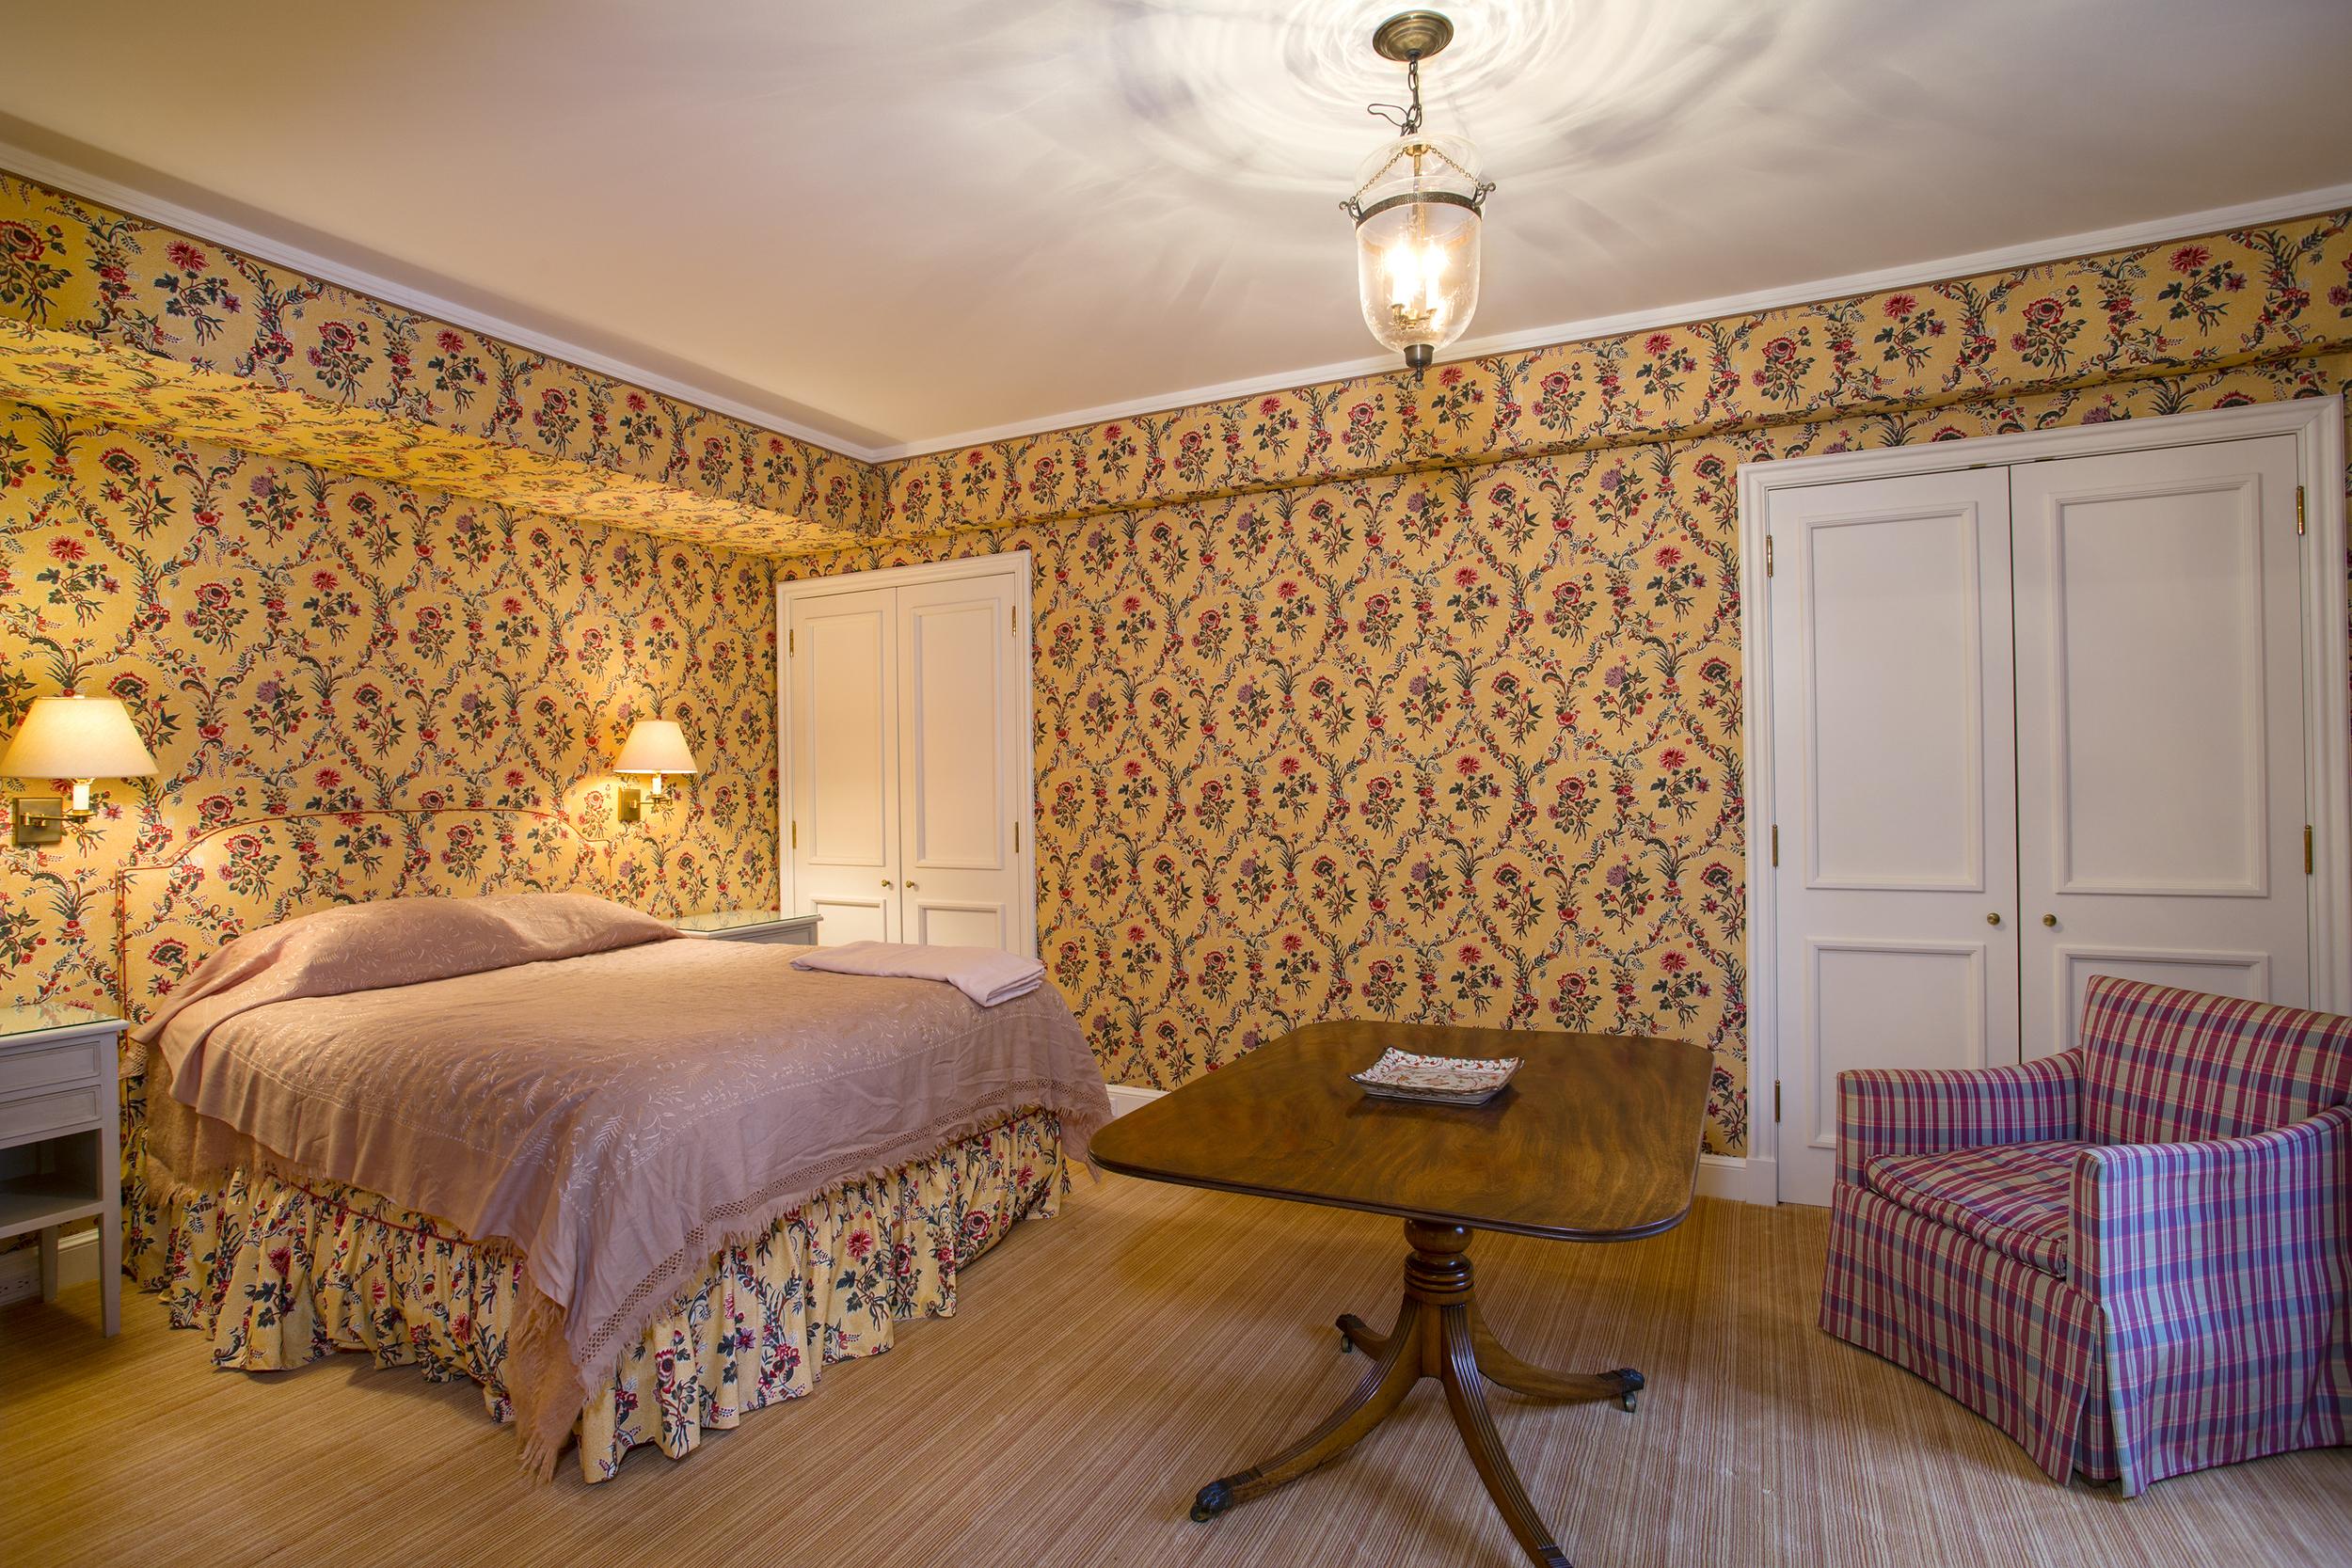 Bed-1b-lrg.jpg